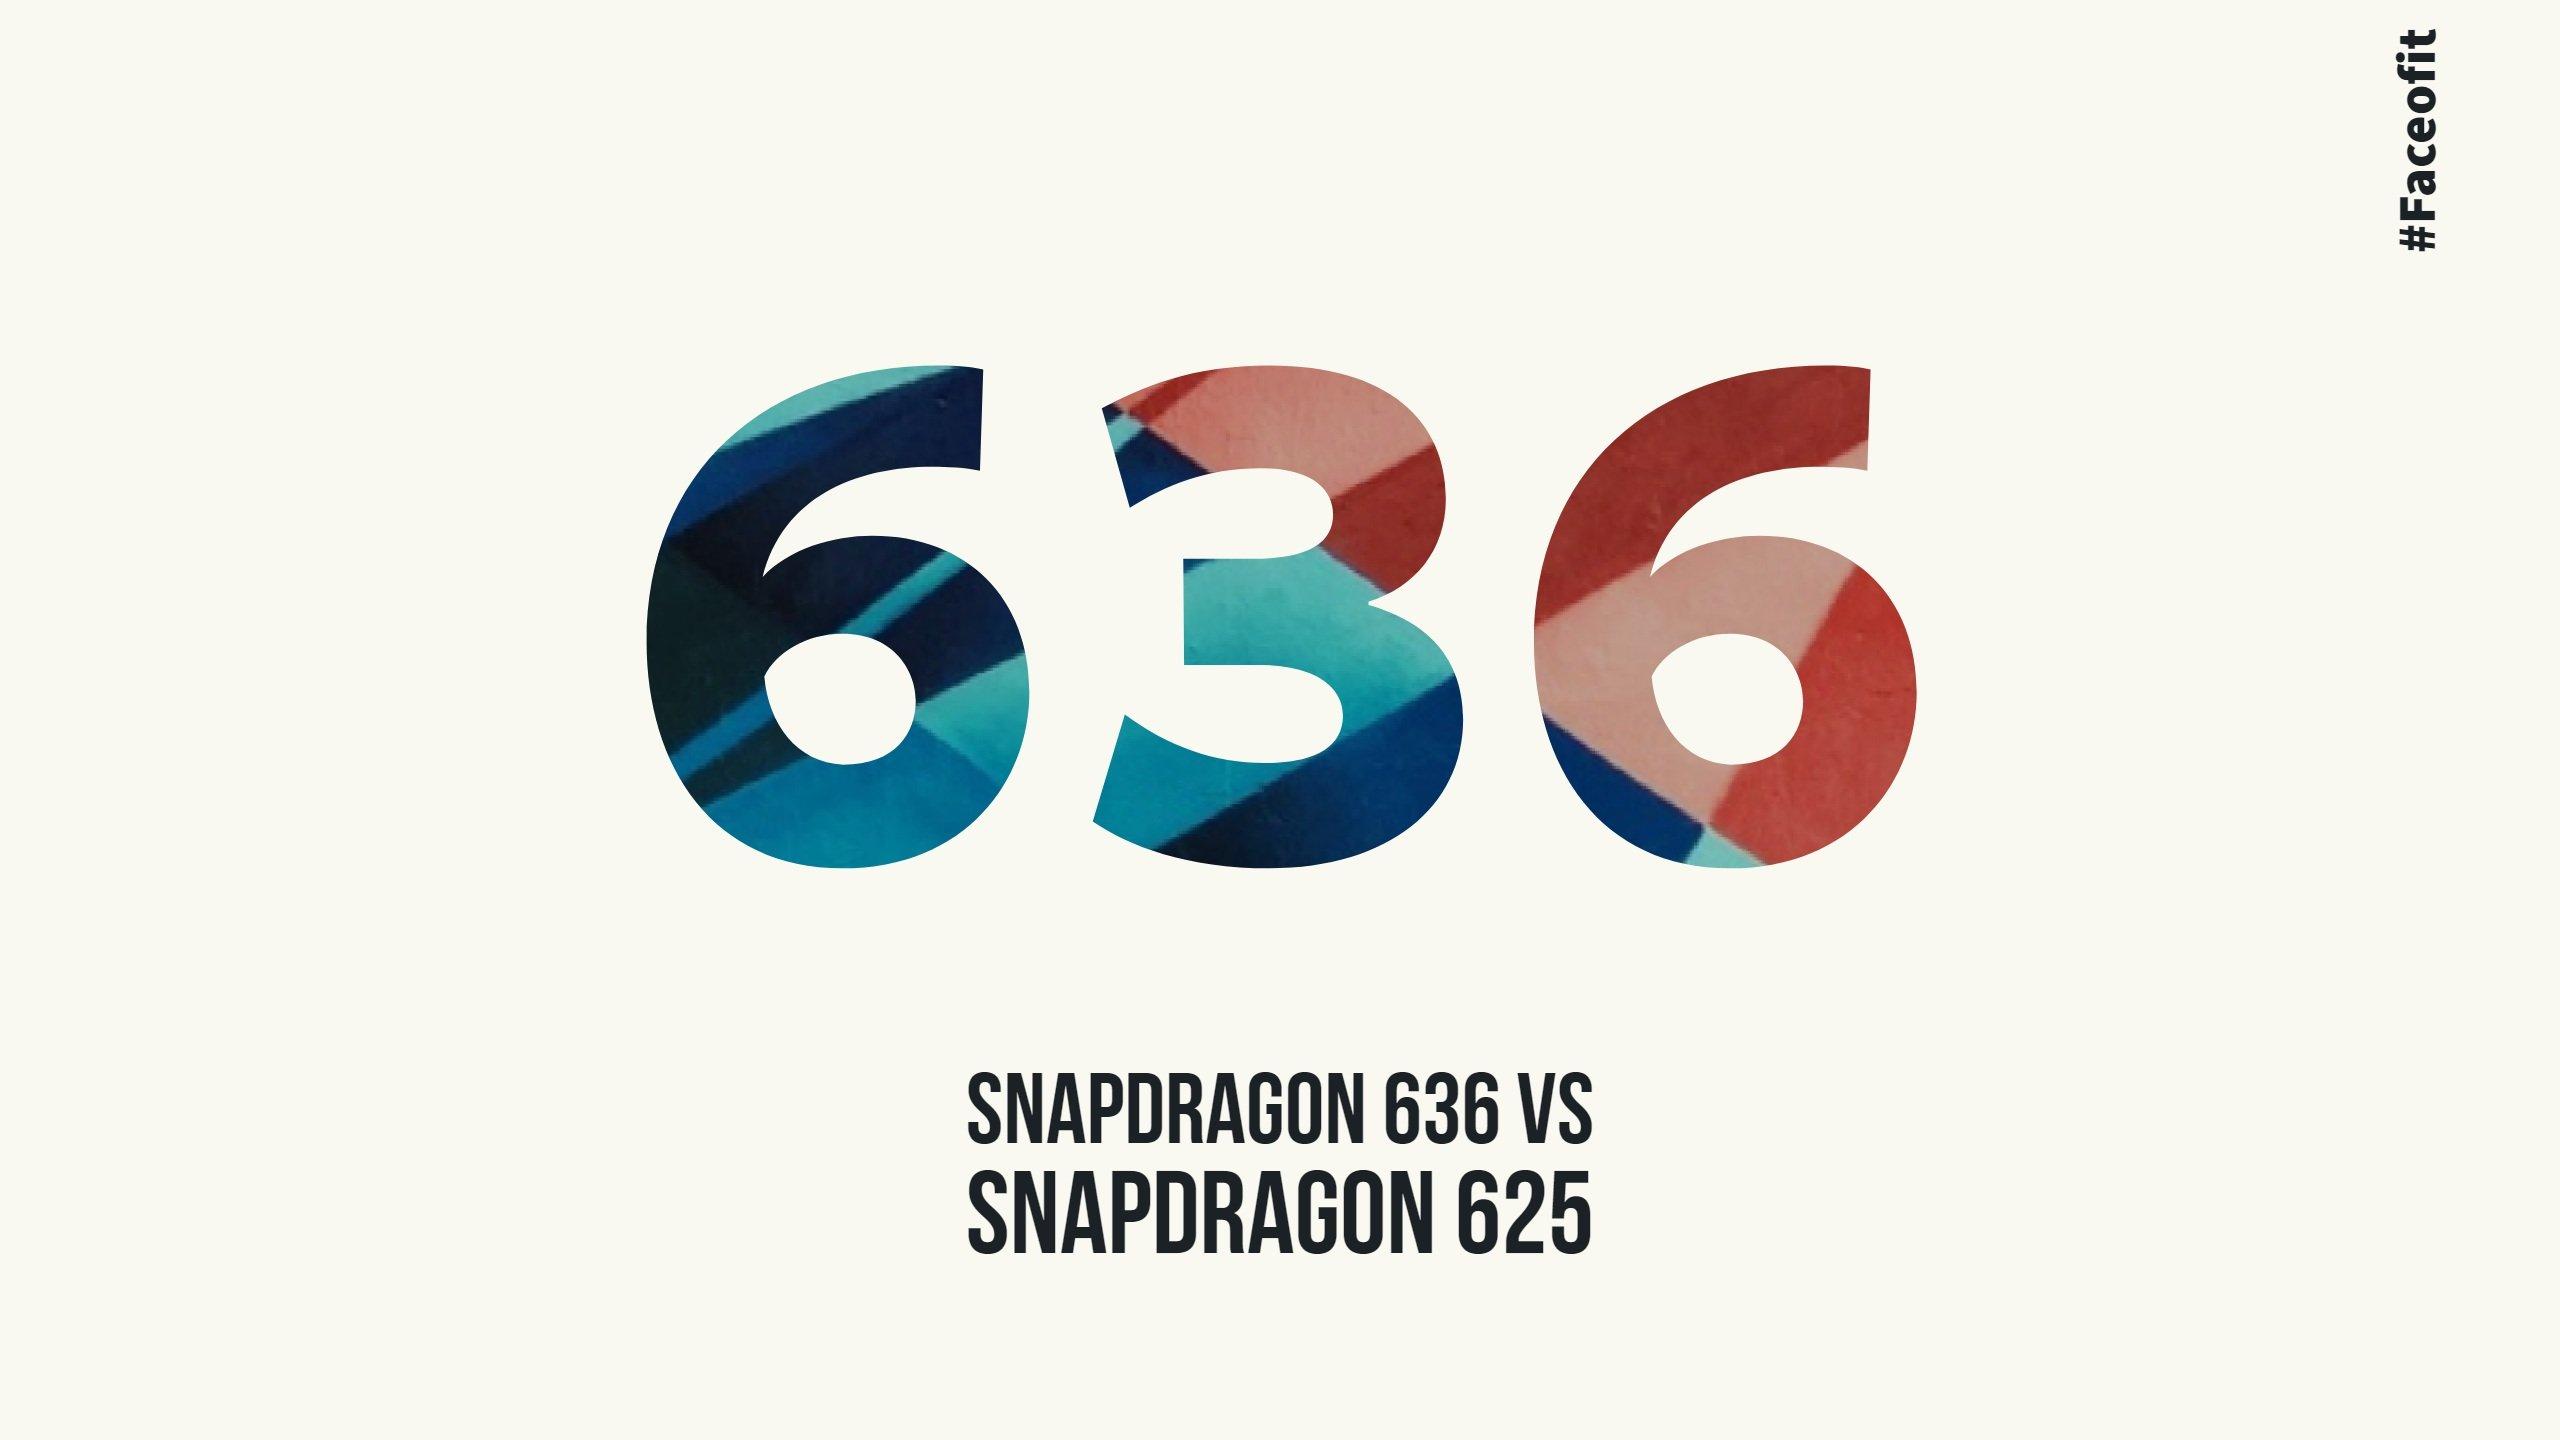 Snapdragon 636 Vs Snapdragon 625